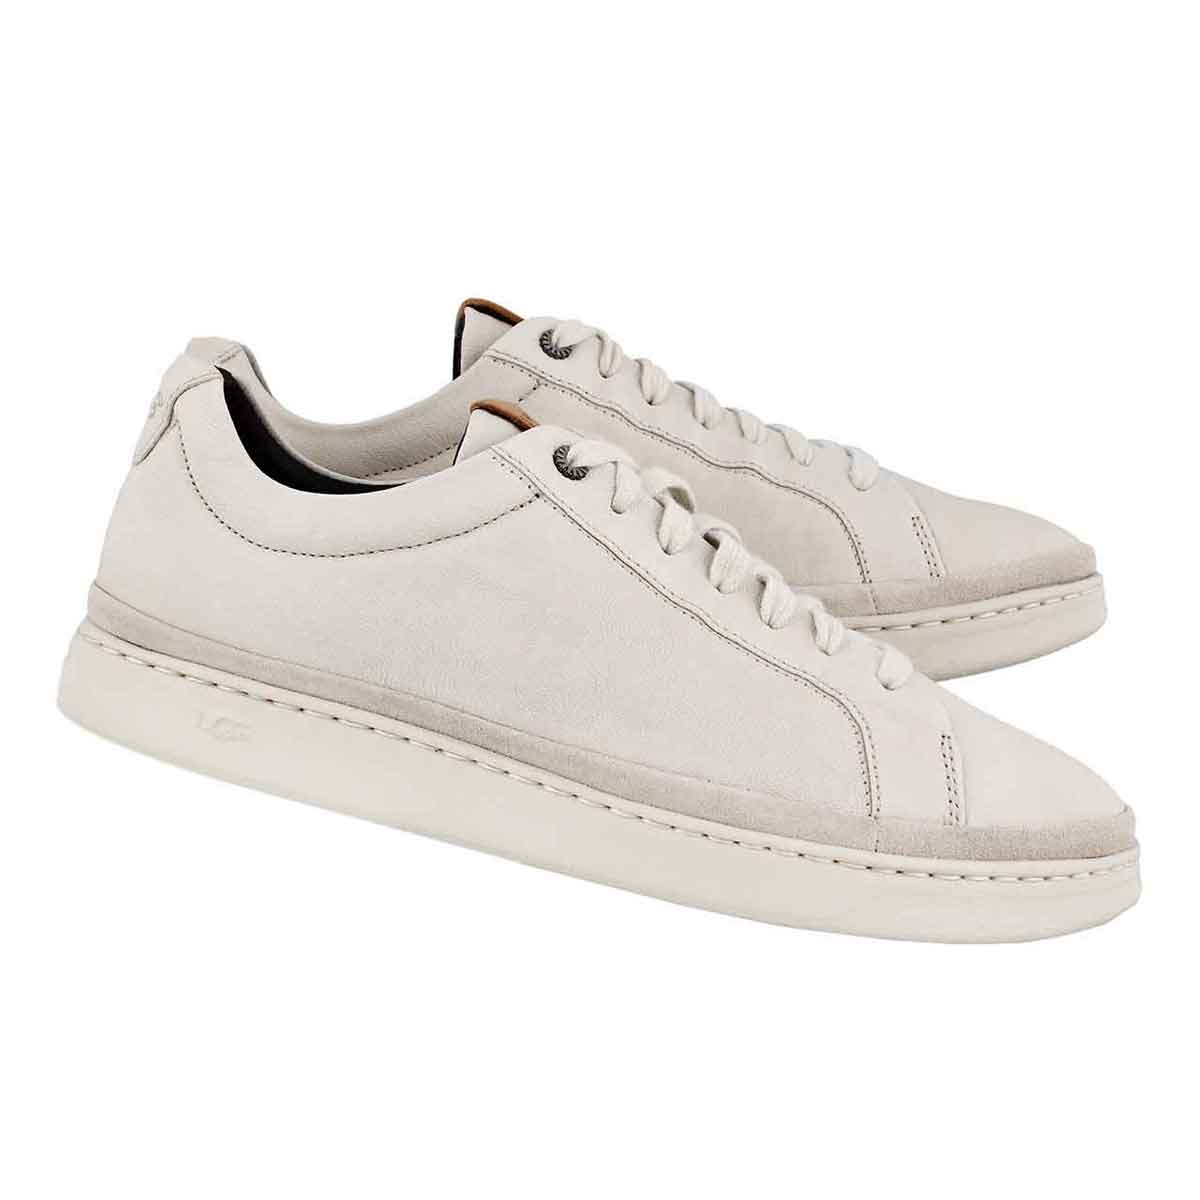 Mns Cali Sneaker Low parchment sneaker